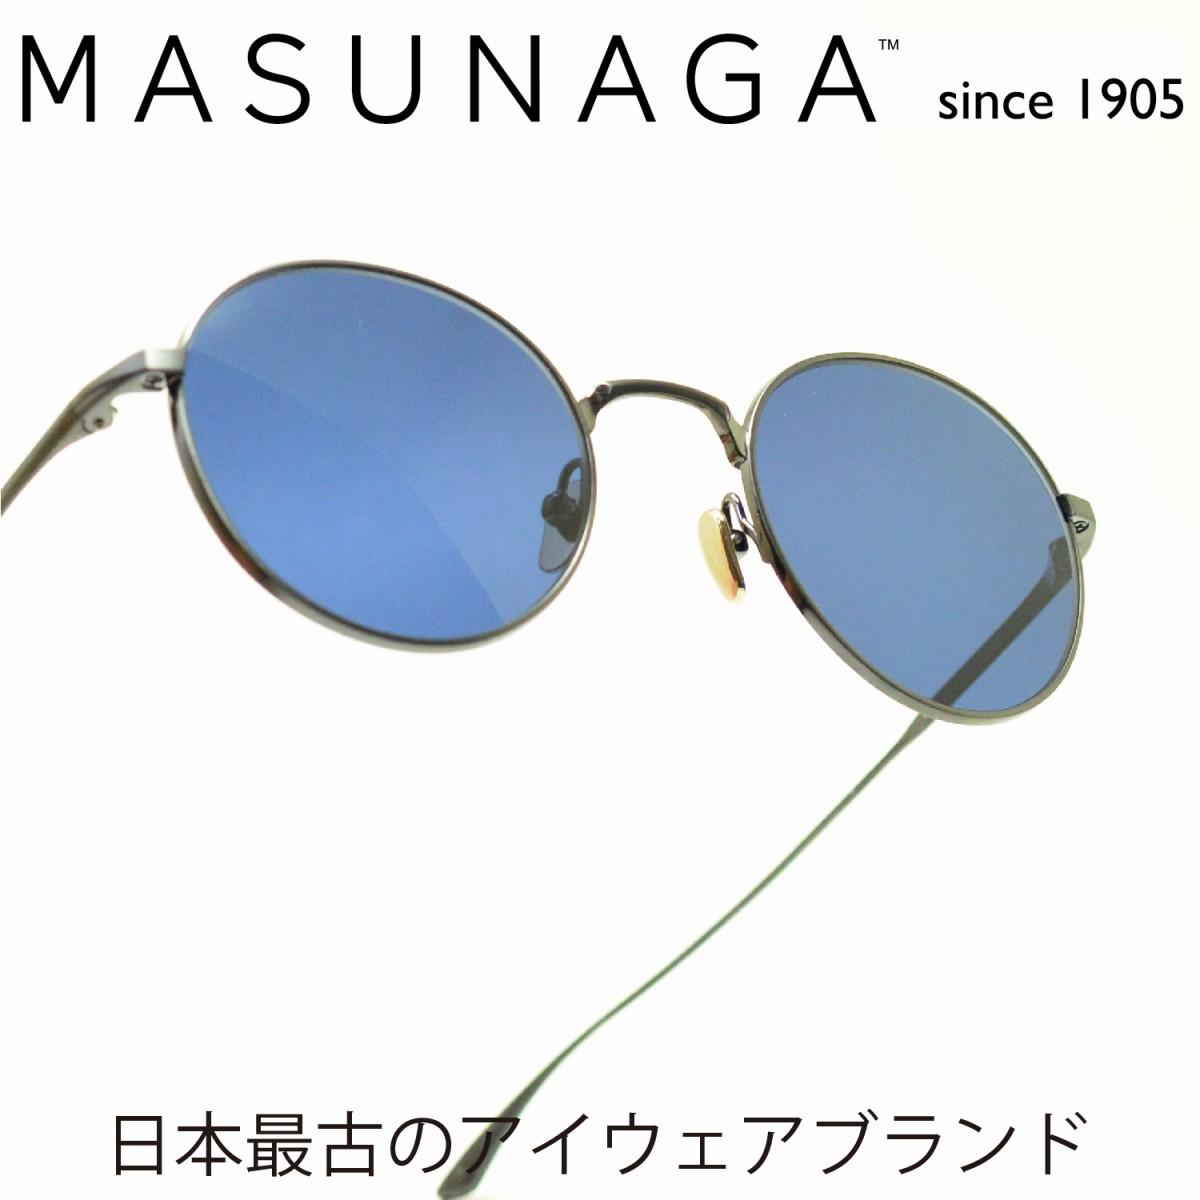 MASUNAGA Since1905 WRIGHT COL-S29メガネ 眼鏡 めがね メンズ レディース おしゃれ ブランド 人気 おすすめ フレーム 流行り 度付き レンズ